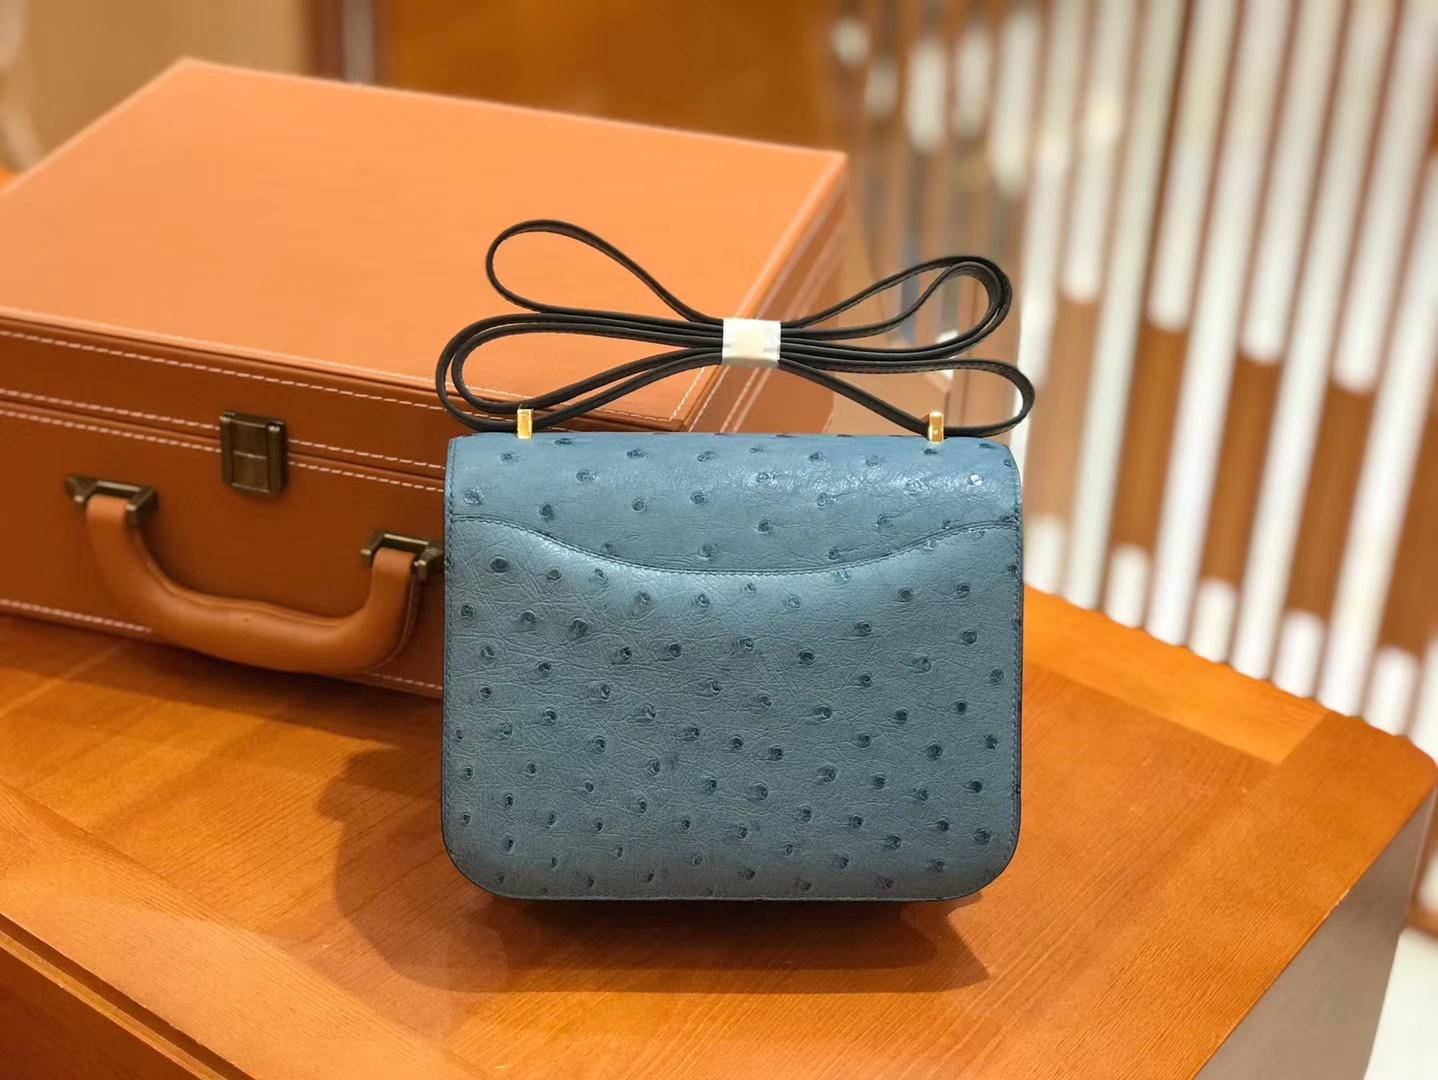 Hermès(爱马仕)Constance 18cm 牛仔蓝 南非KK级鸵鸟皮 金扣 原版蜜蜡线 顶级手缝